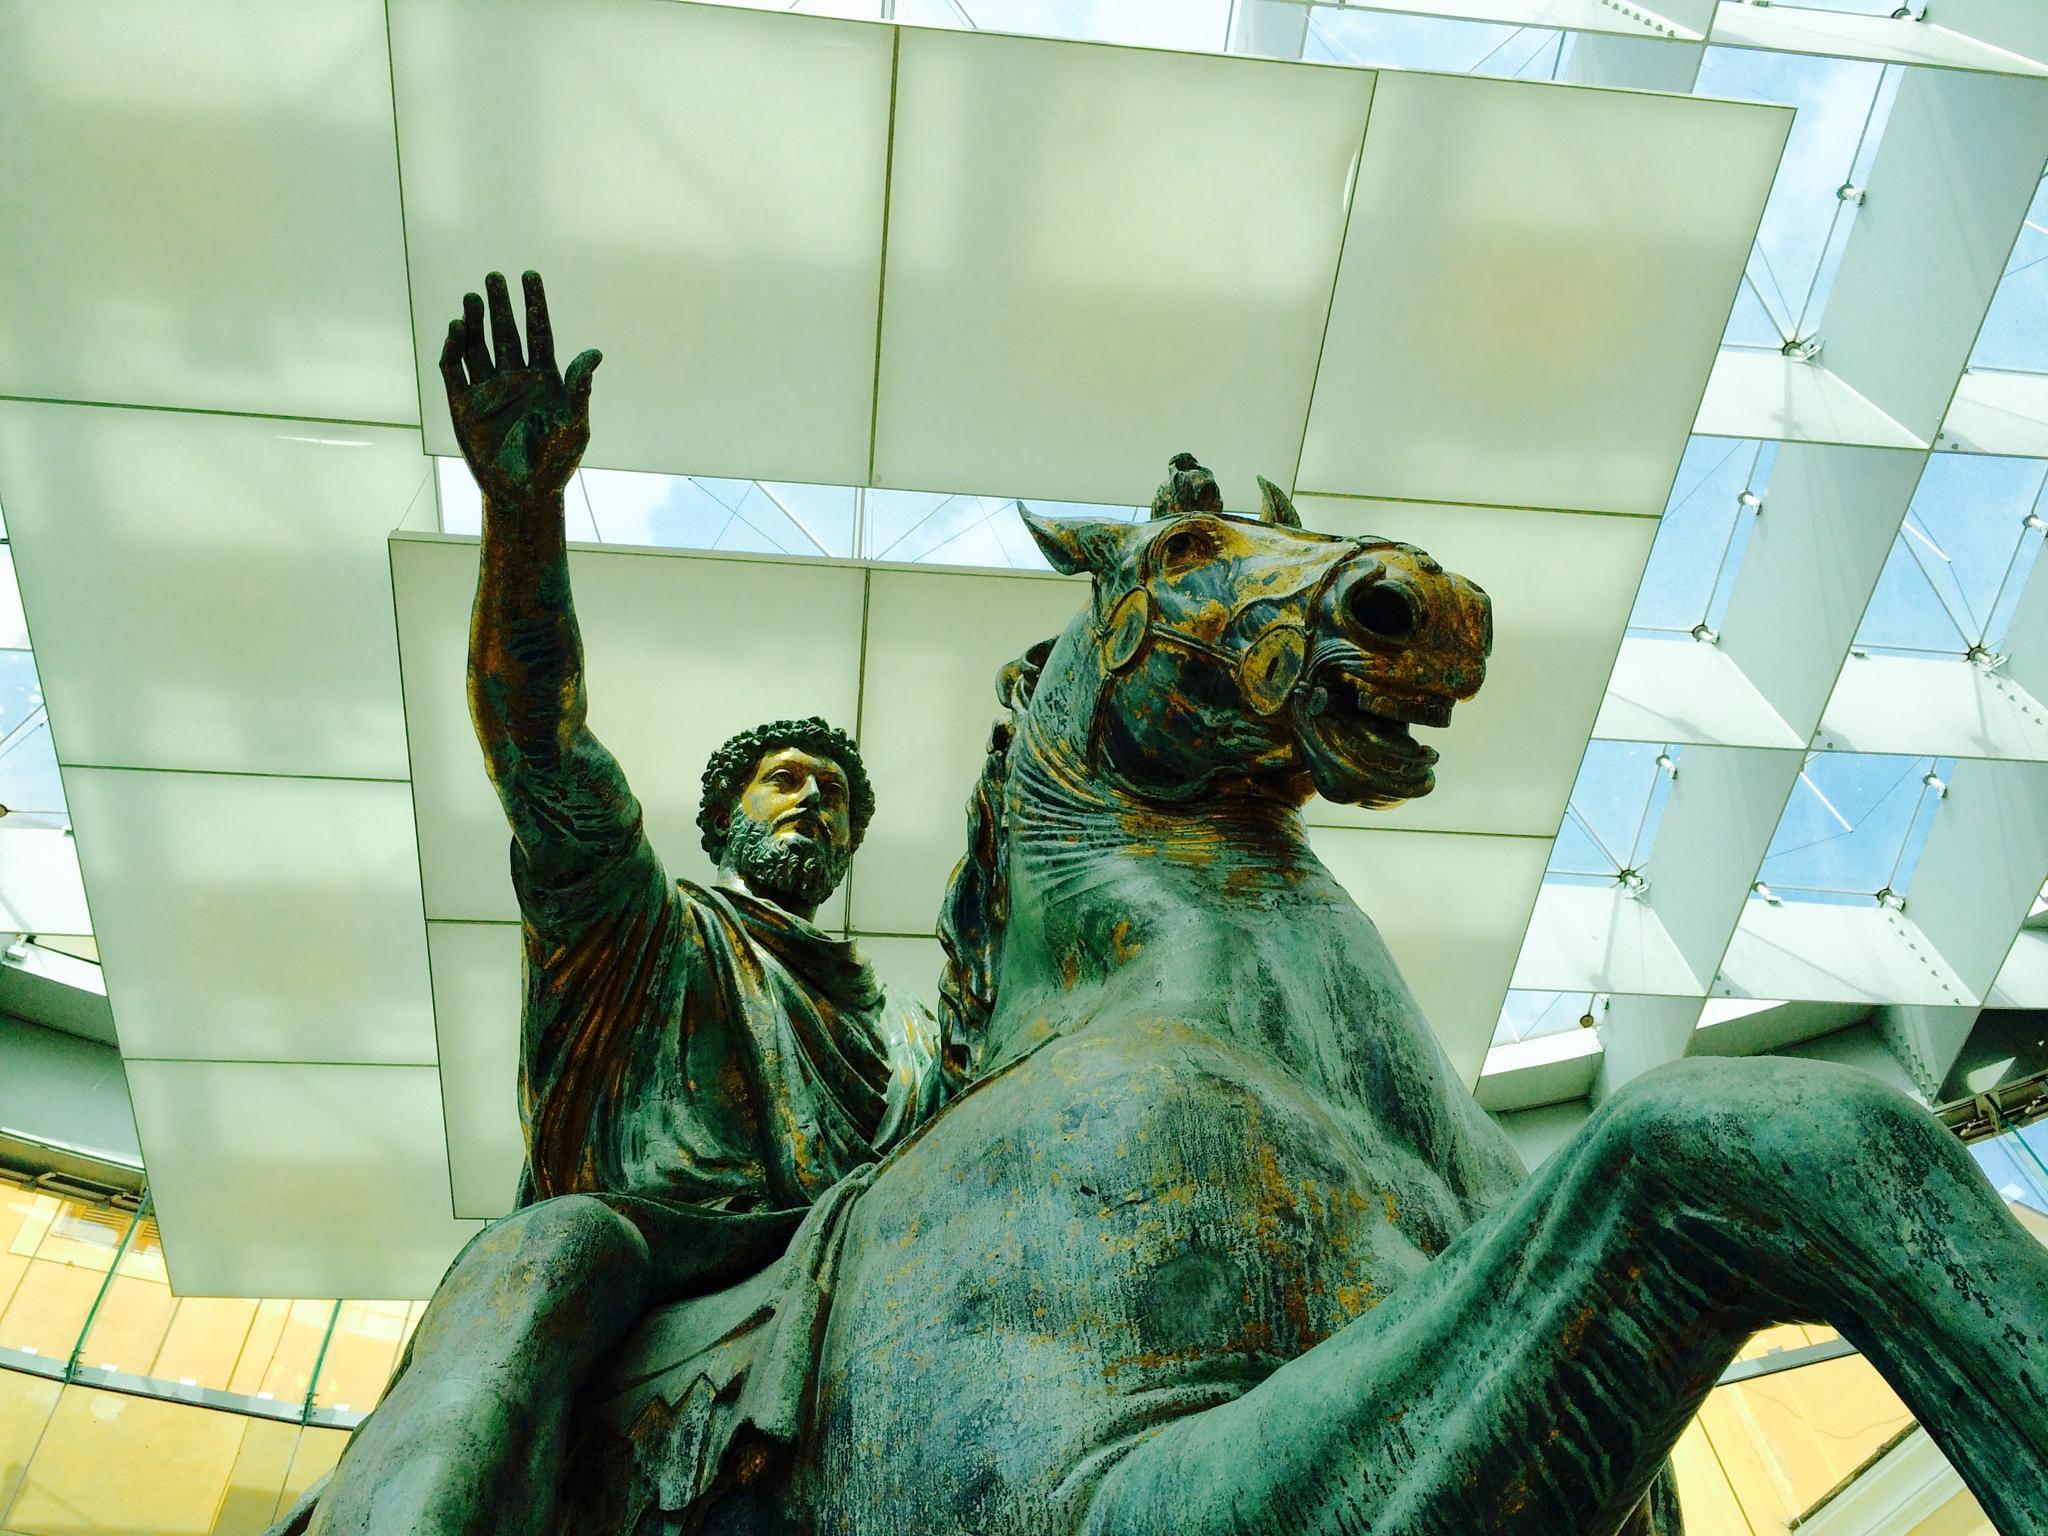 Marco Aurelio by coiatellimarco